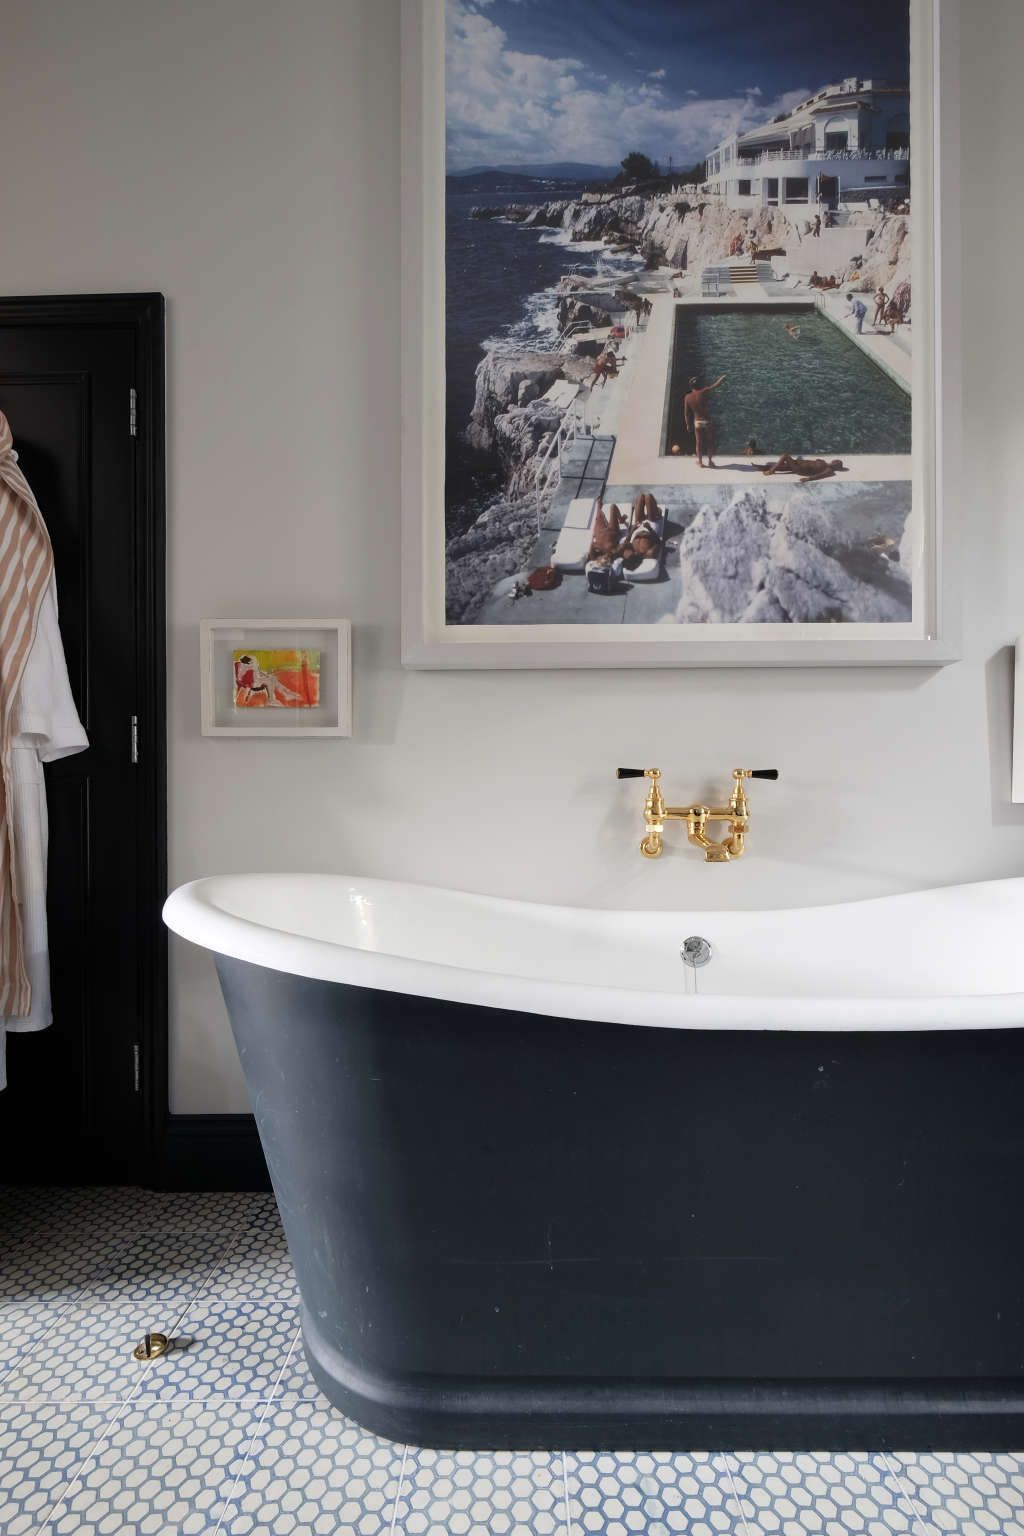 How To Clean an Old Porcelain Enamel Bathtub or Sink